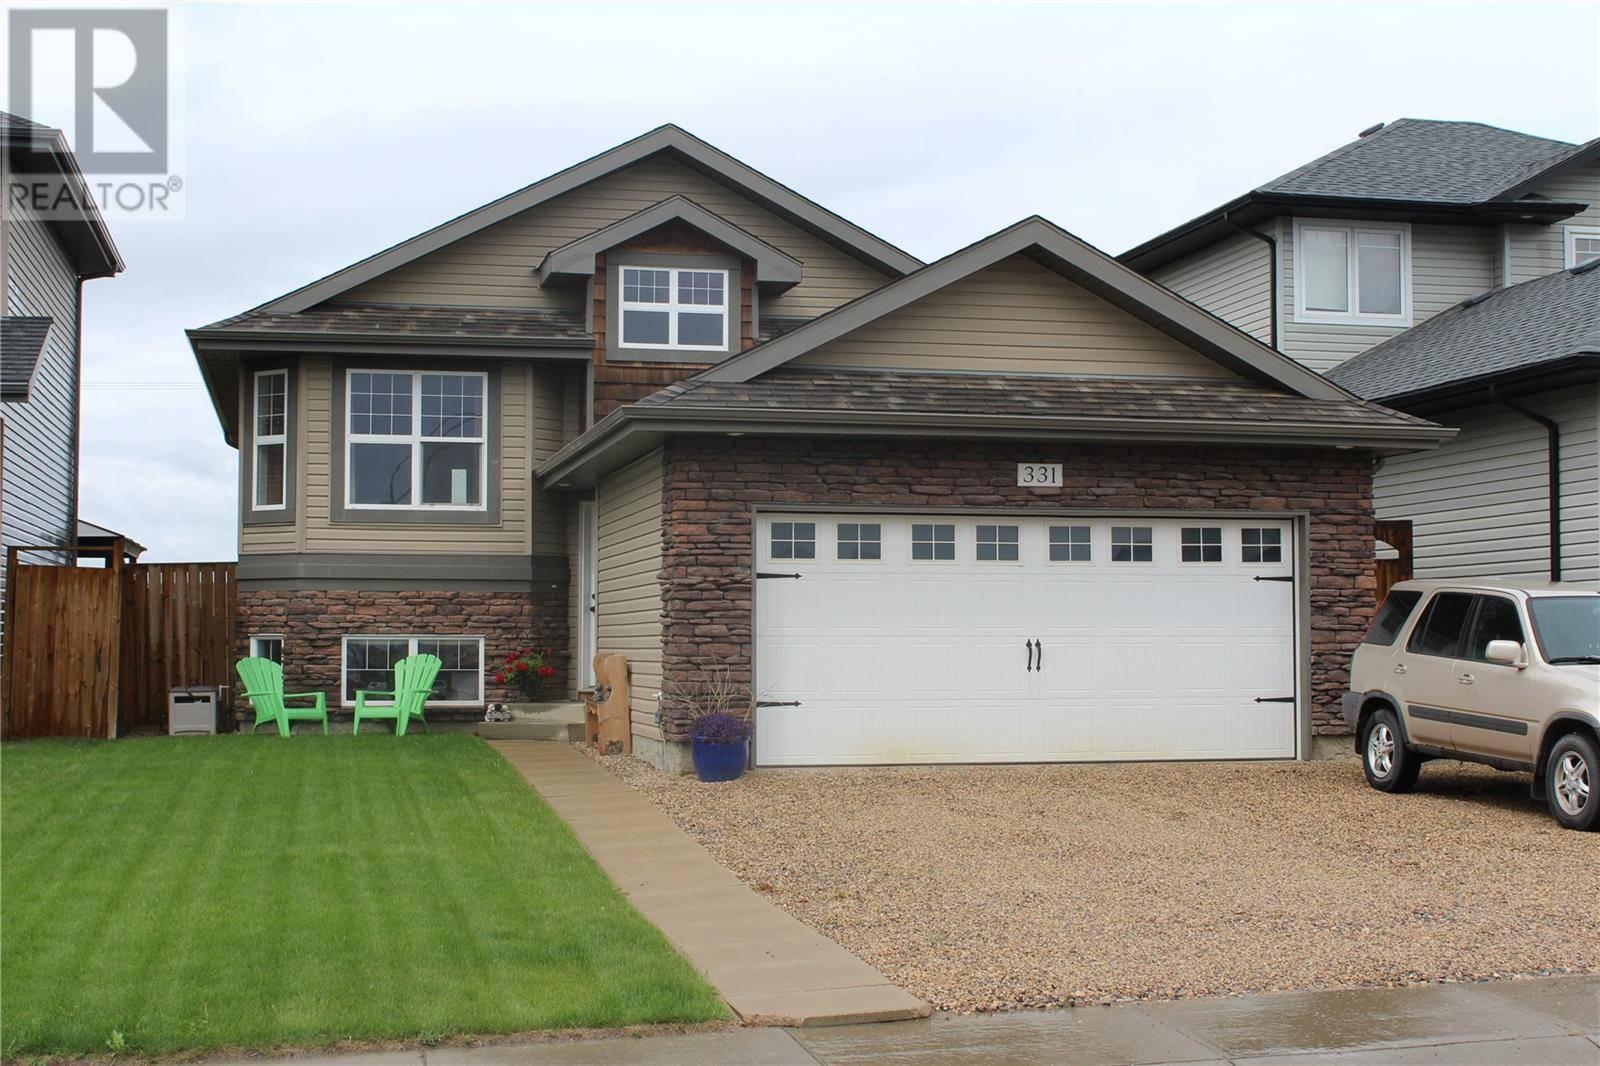 House for sale at 331 Korol Cres Saskatoon Saskatchewan - MLS: SK777694